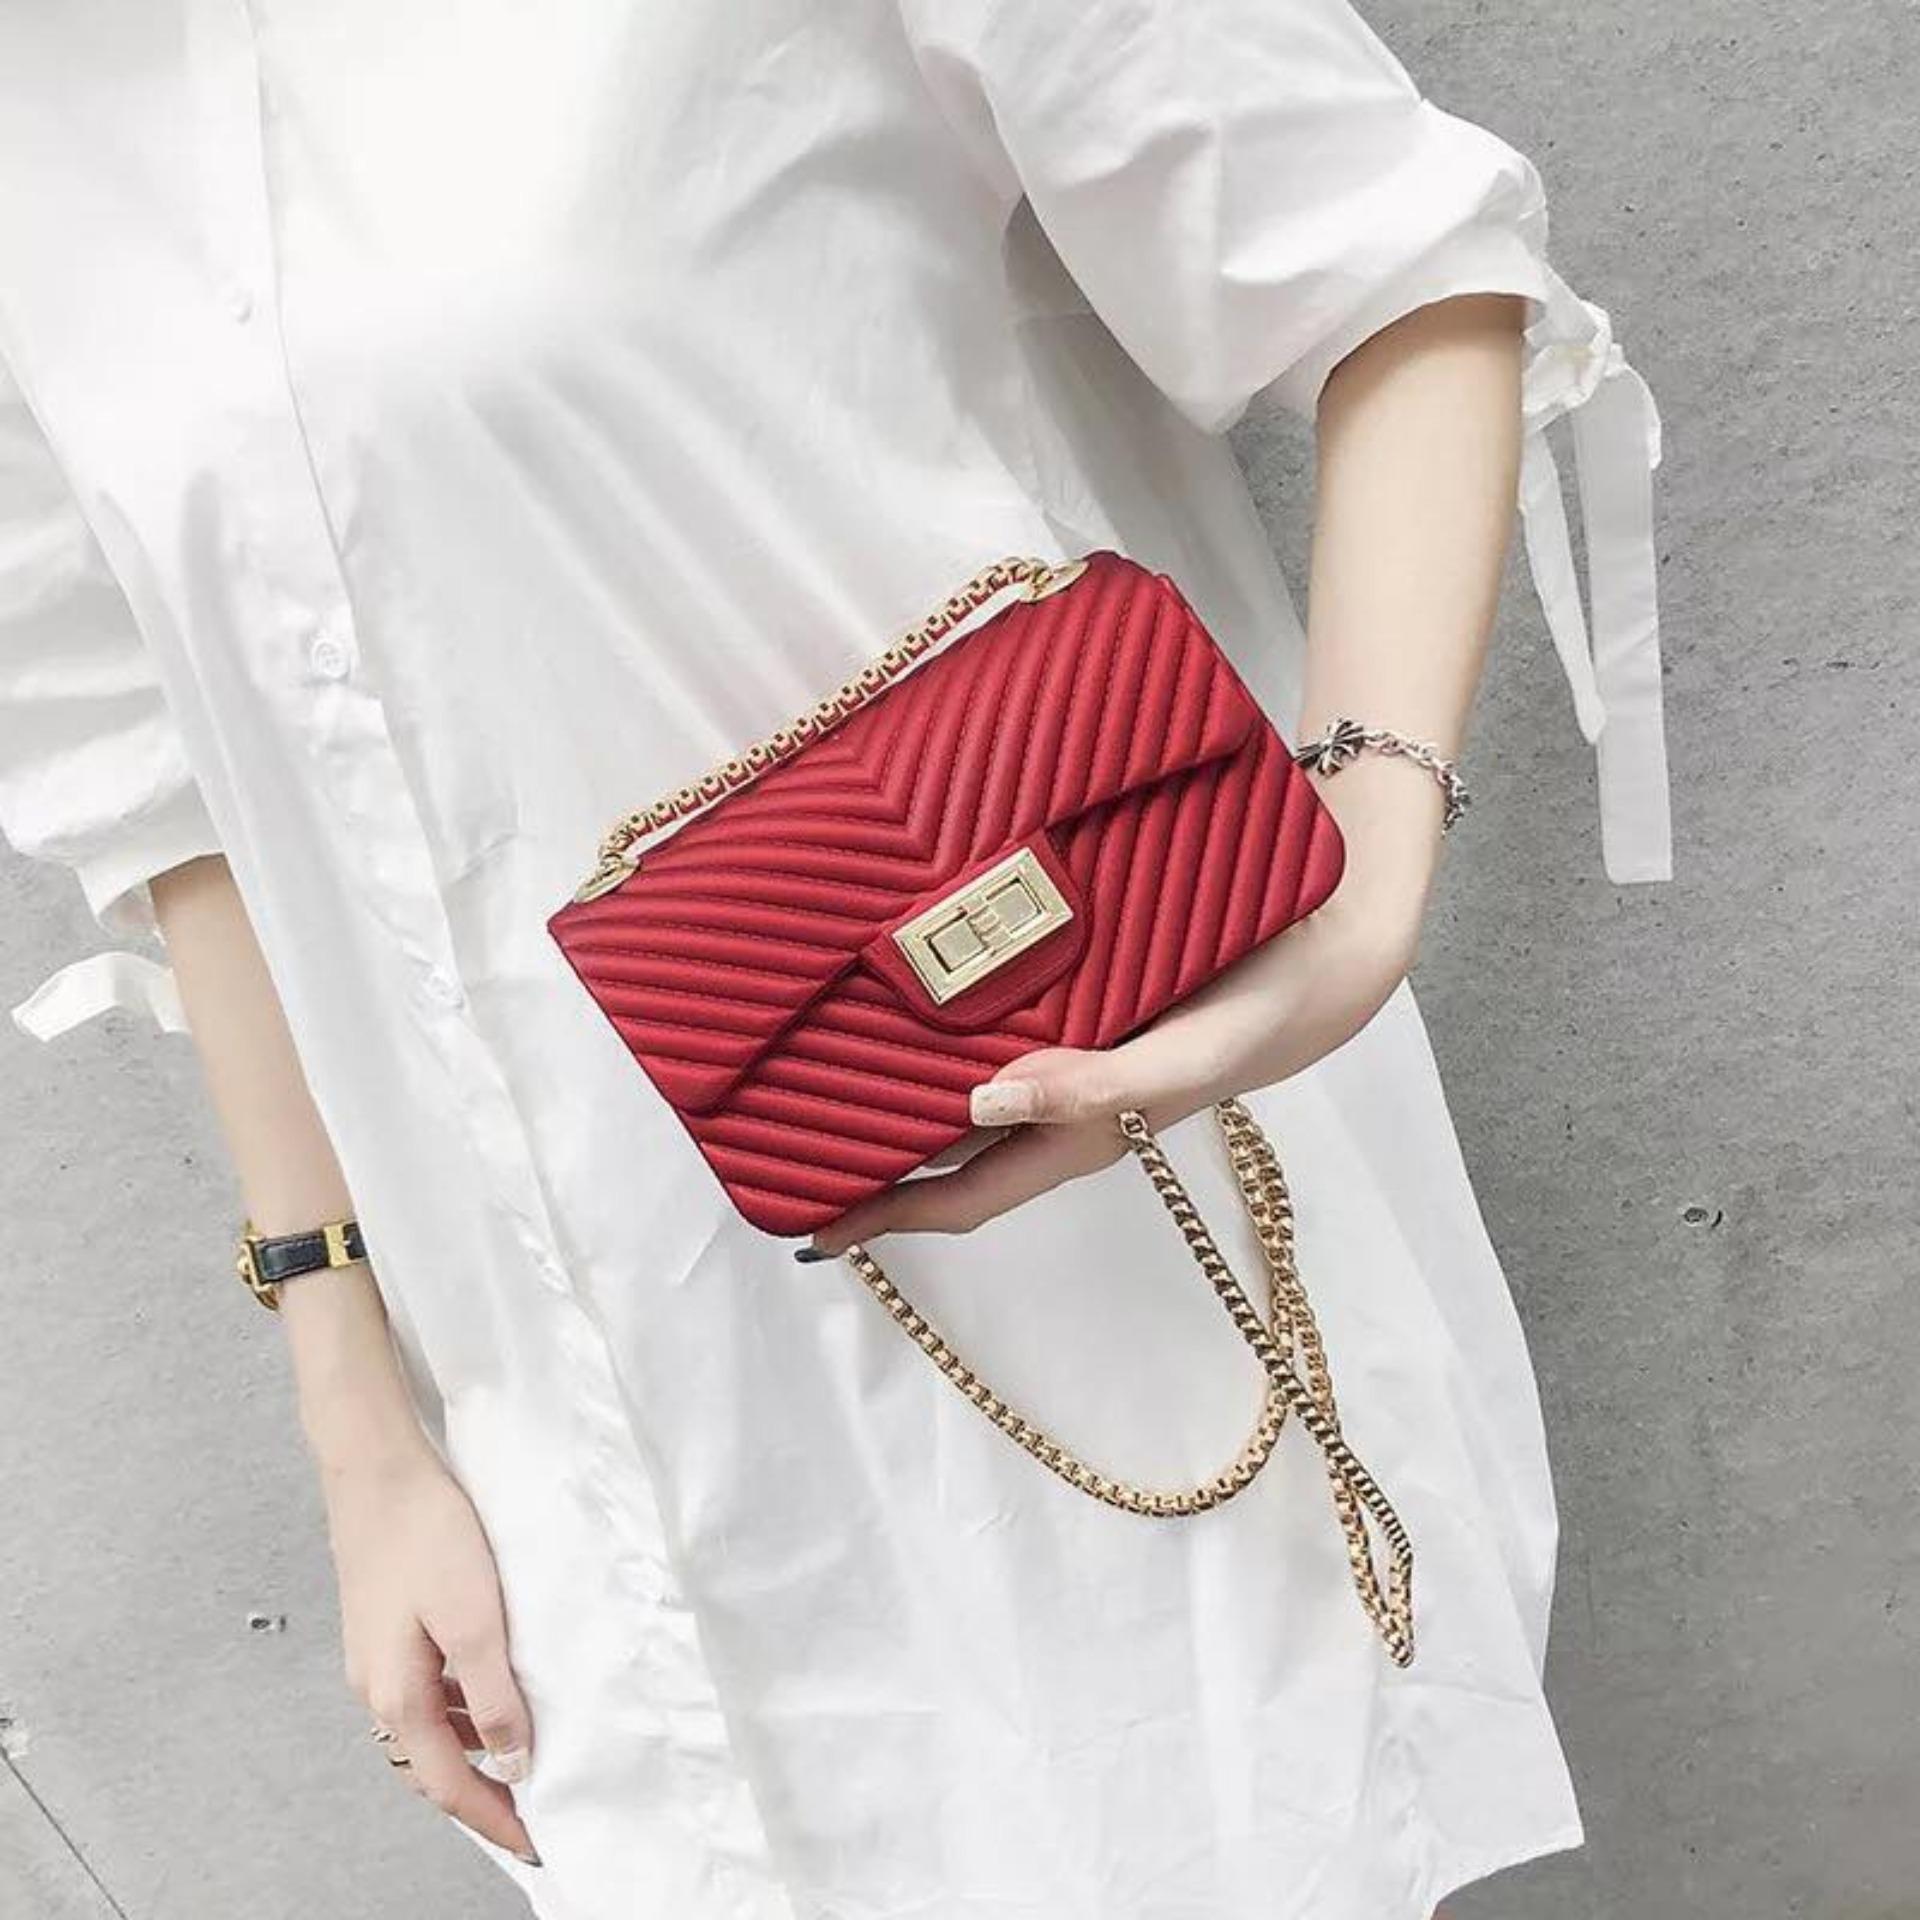 b0153f9997a3 Ella  478 Jelly Bag Jelly Sling Bag High Class Elegant Design Smooth Rubber  Waterproof Case